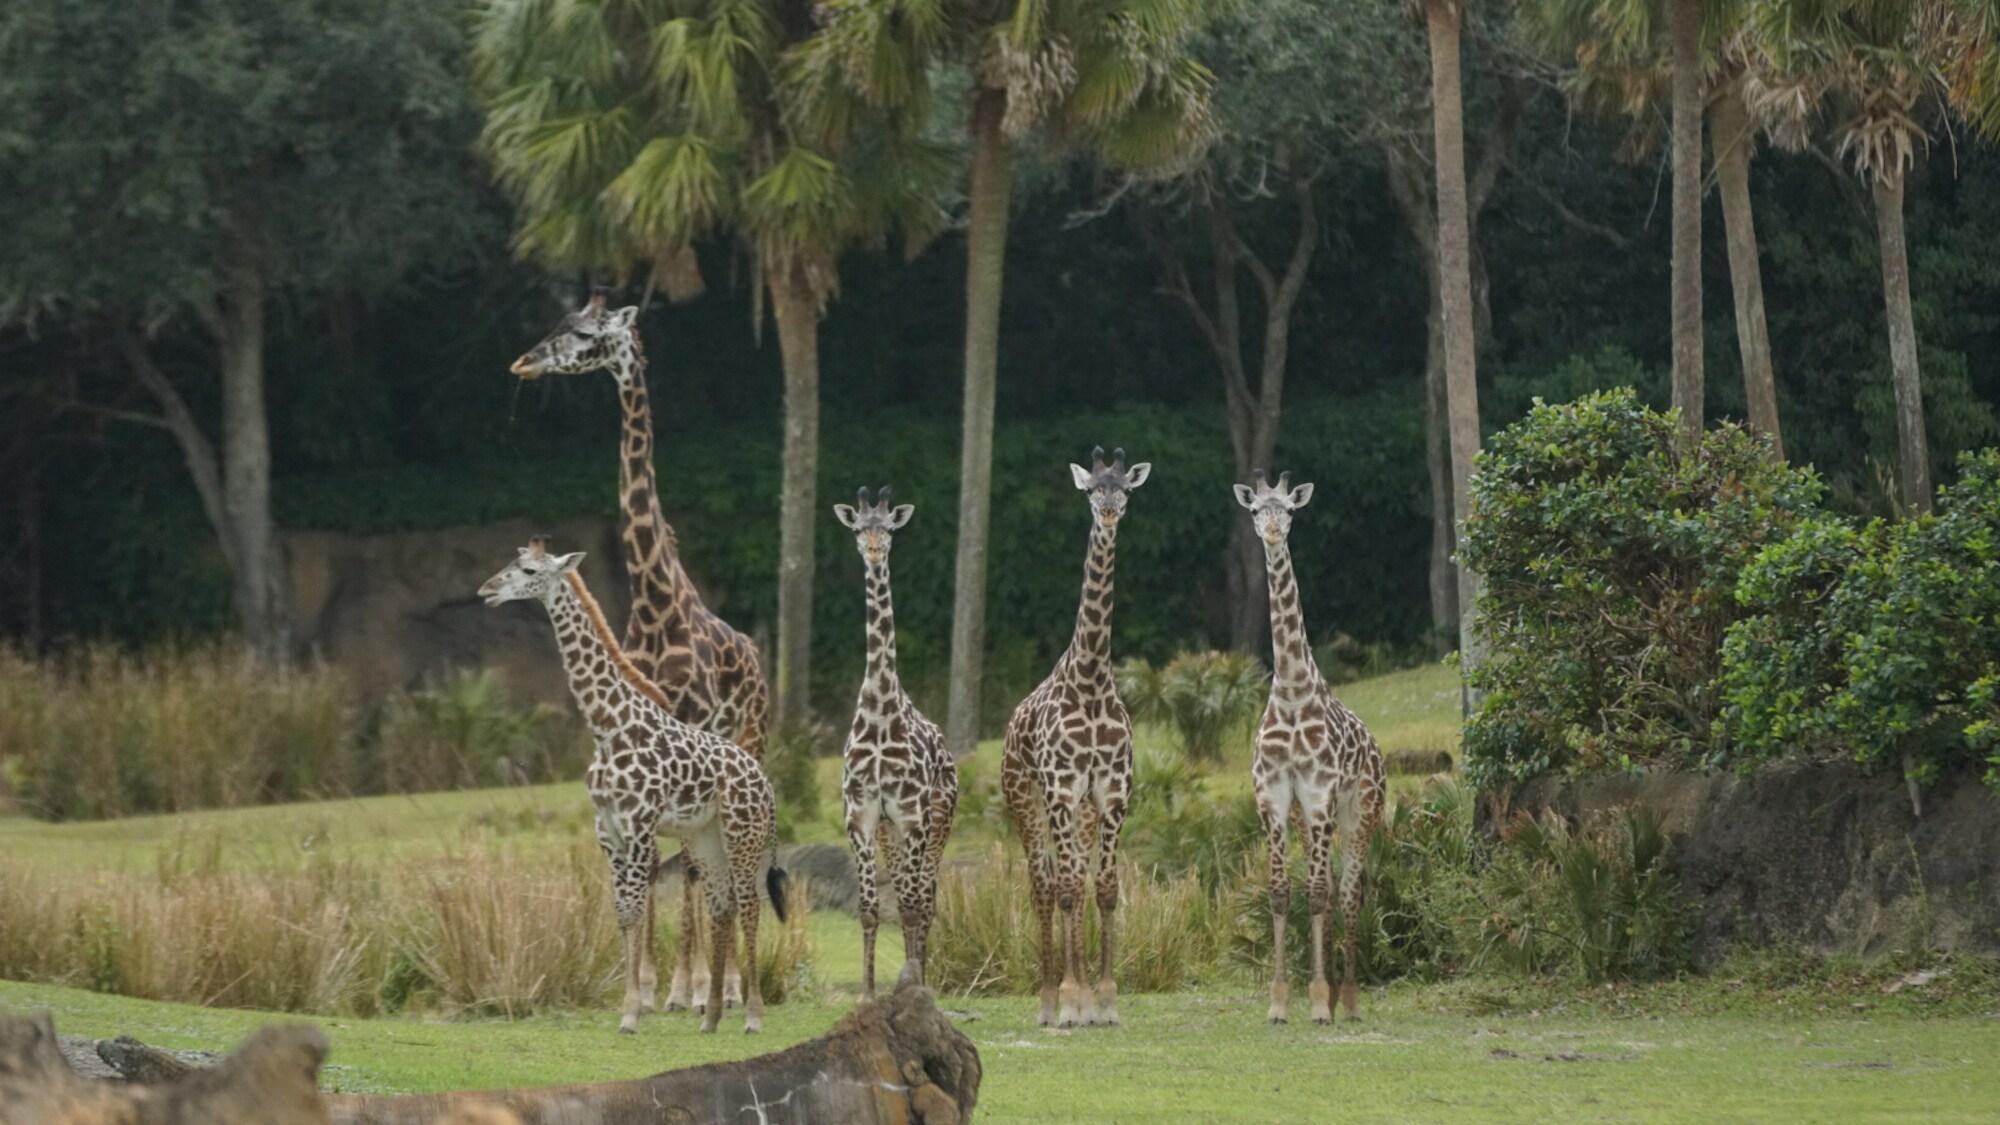 Masai giraffes on the savannah at the Kilimanjaro Safari. (Disney)